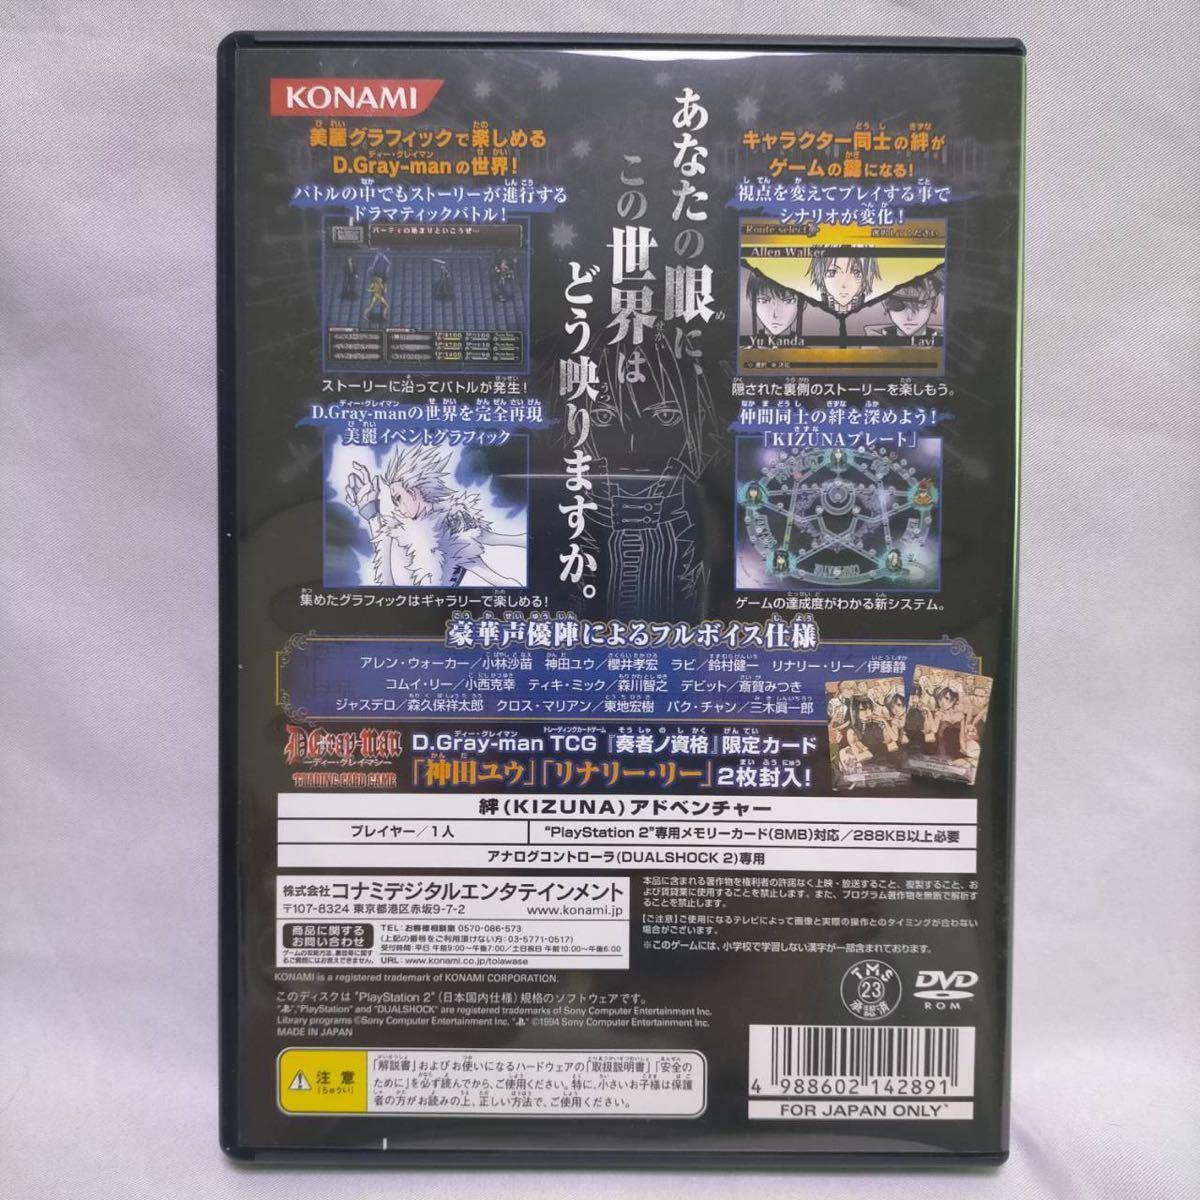 PS2専用ソフト ディー・グレイマン 奏者ノ資格 特典カード付 現状品 PS2ソフト プレイステーション2